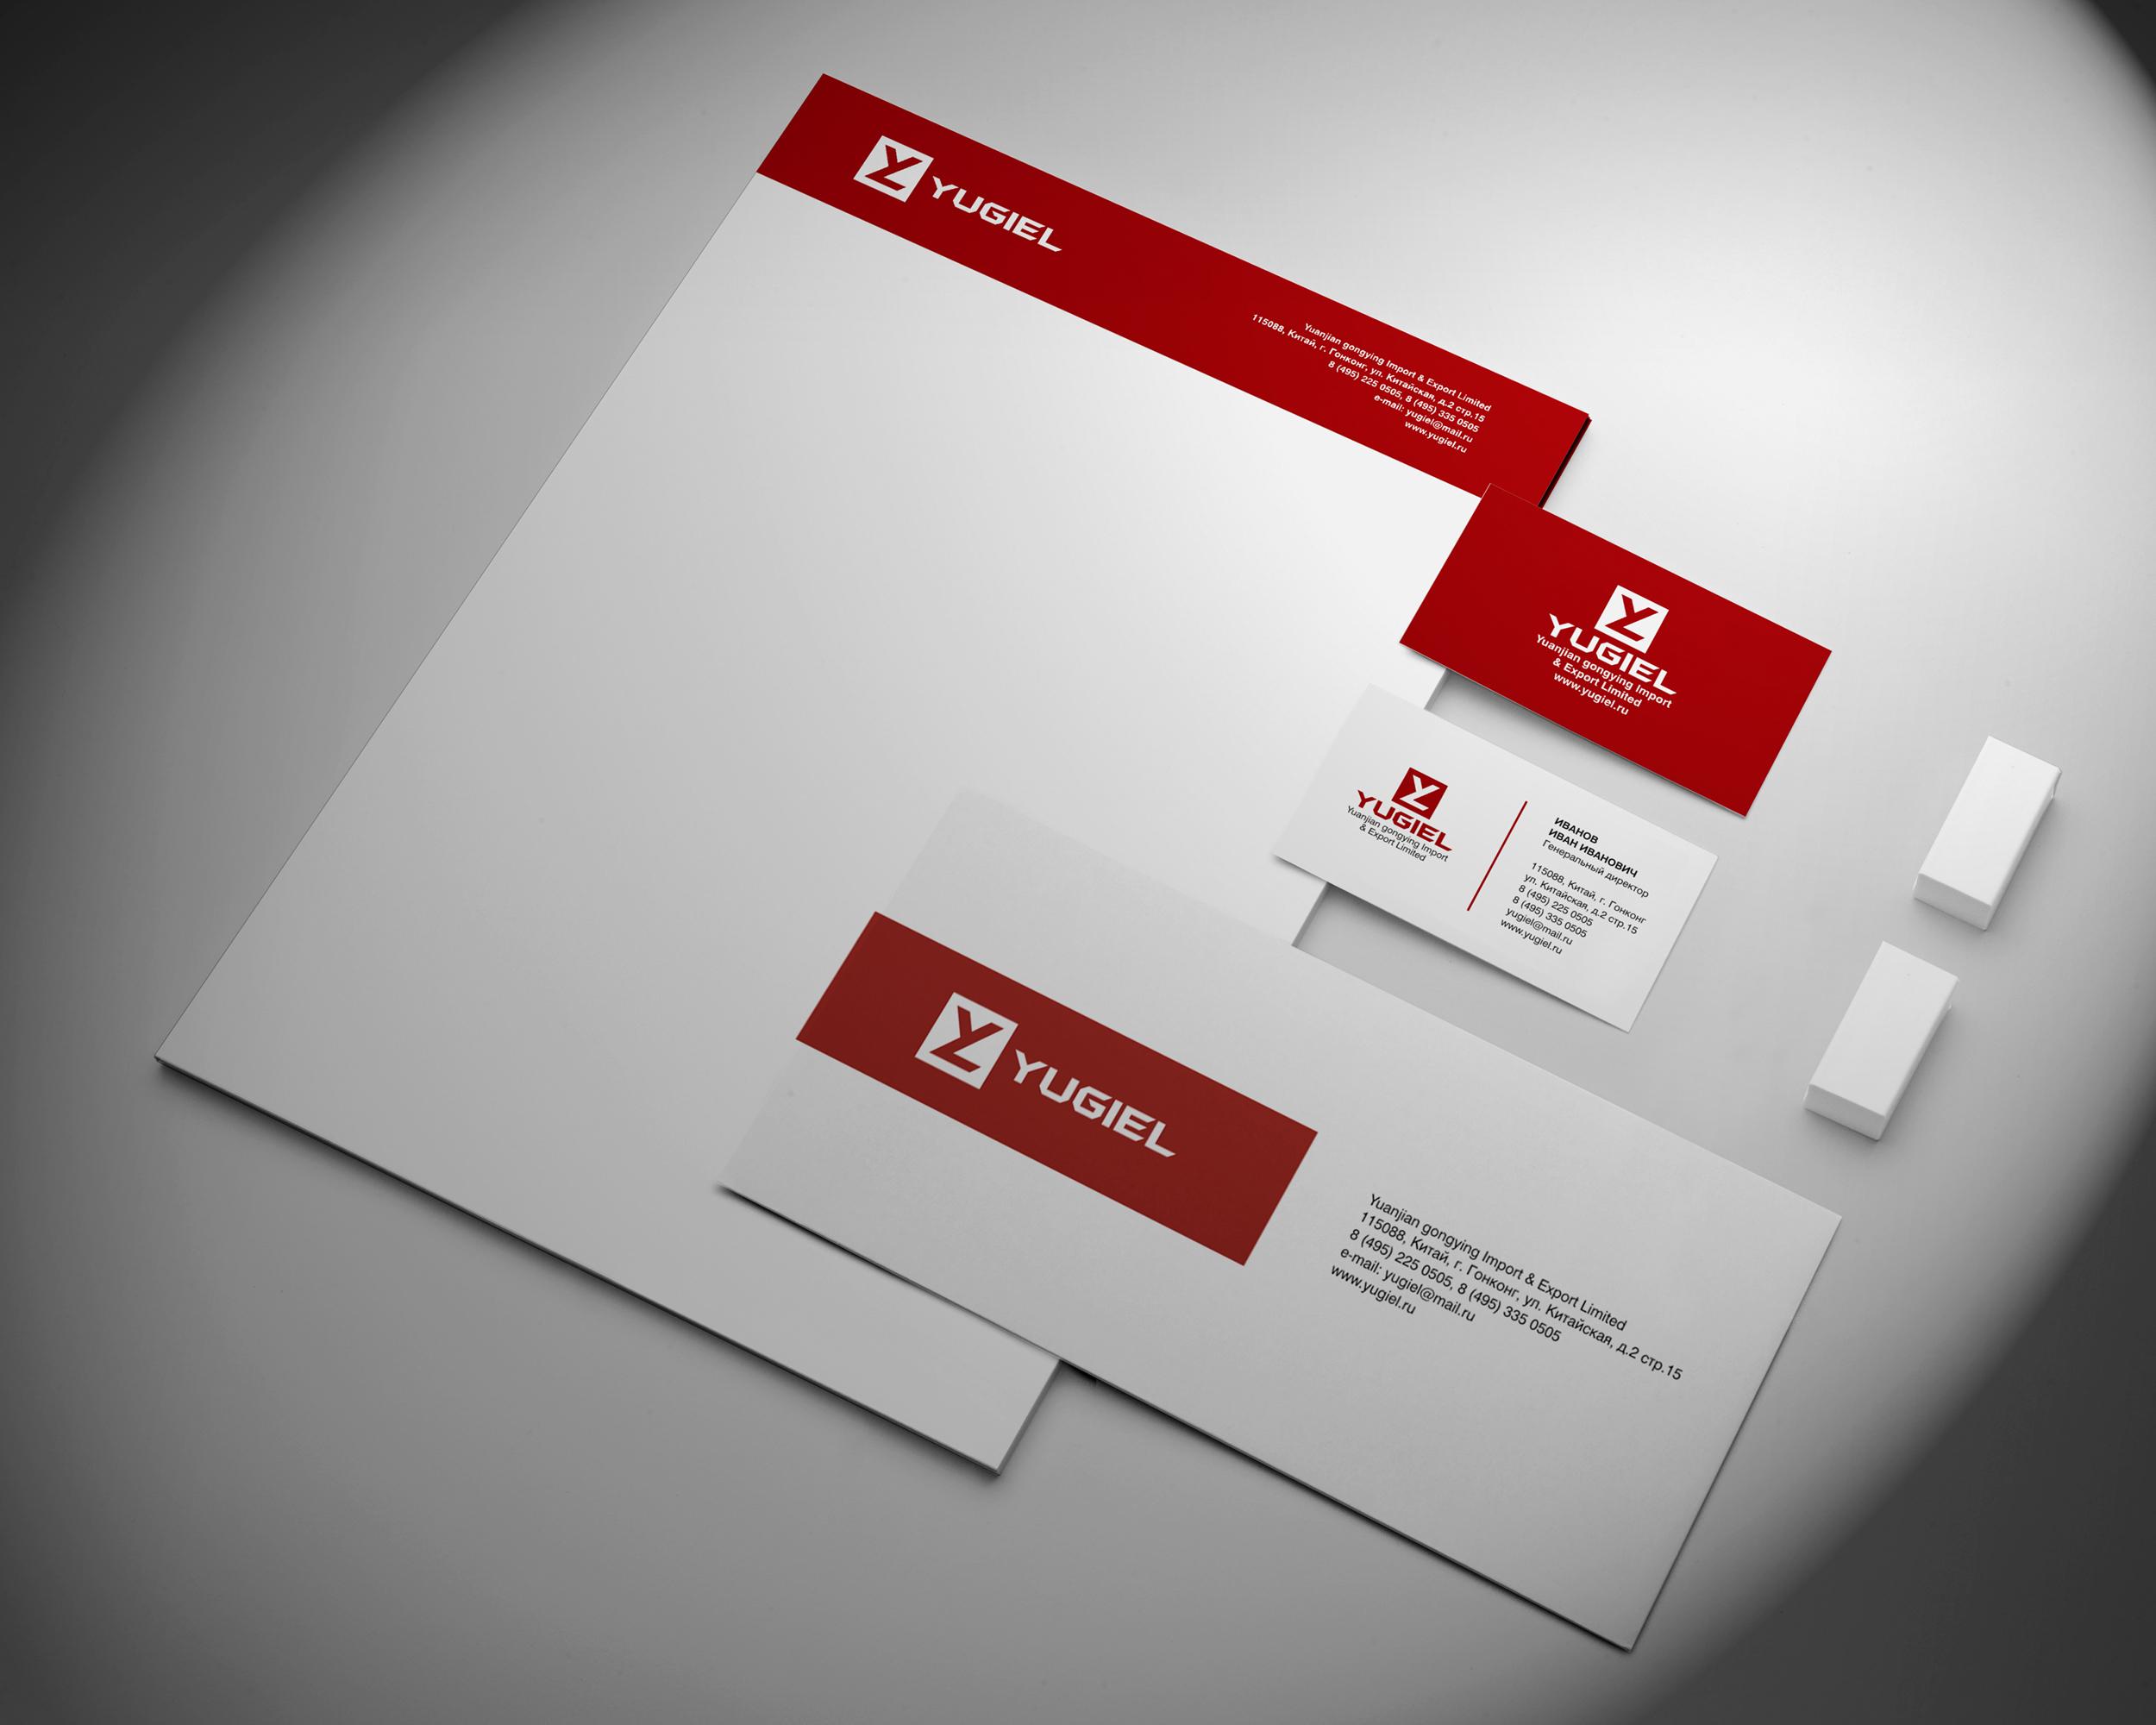 Логотип и фирменный стиль фото f_0535adf2b7338f43.jpg